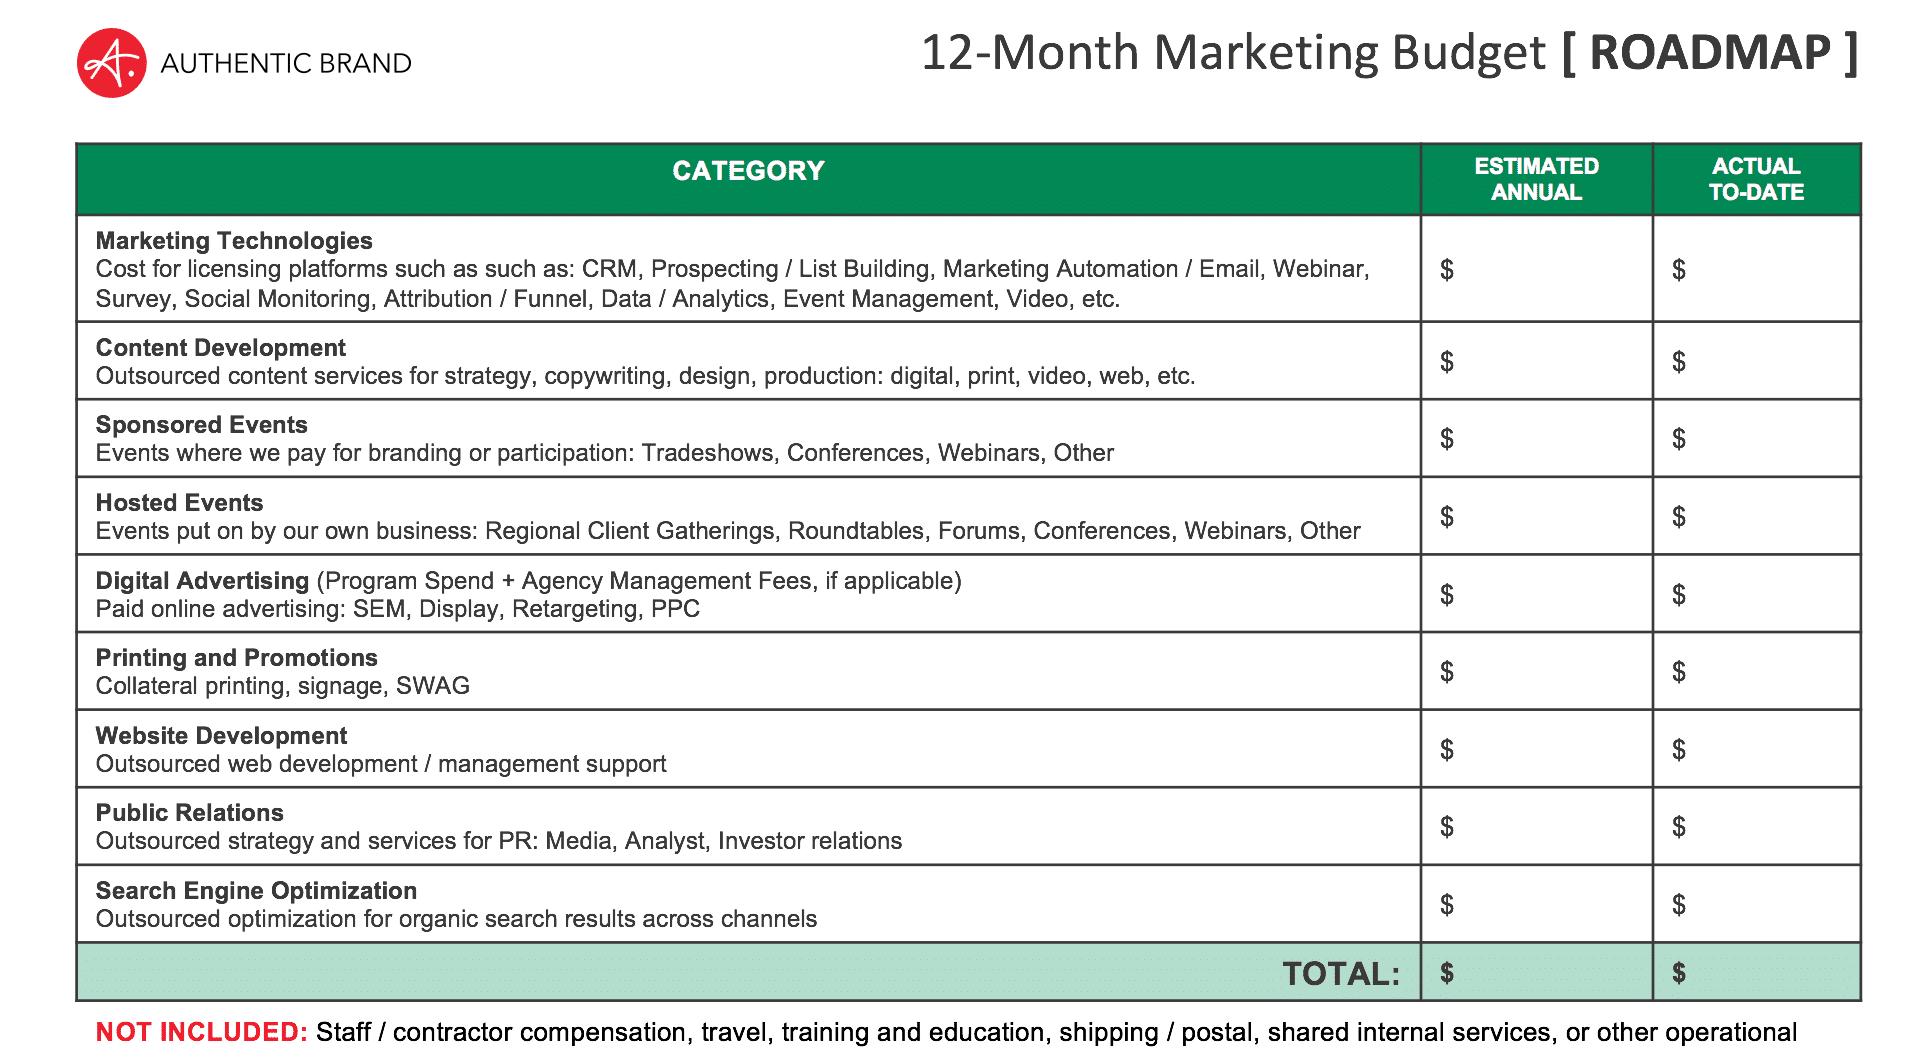 Authentic Brand: Marketing Program Budget Template